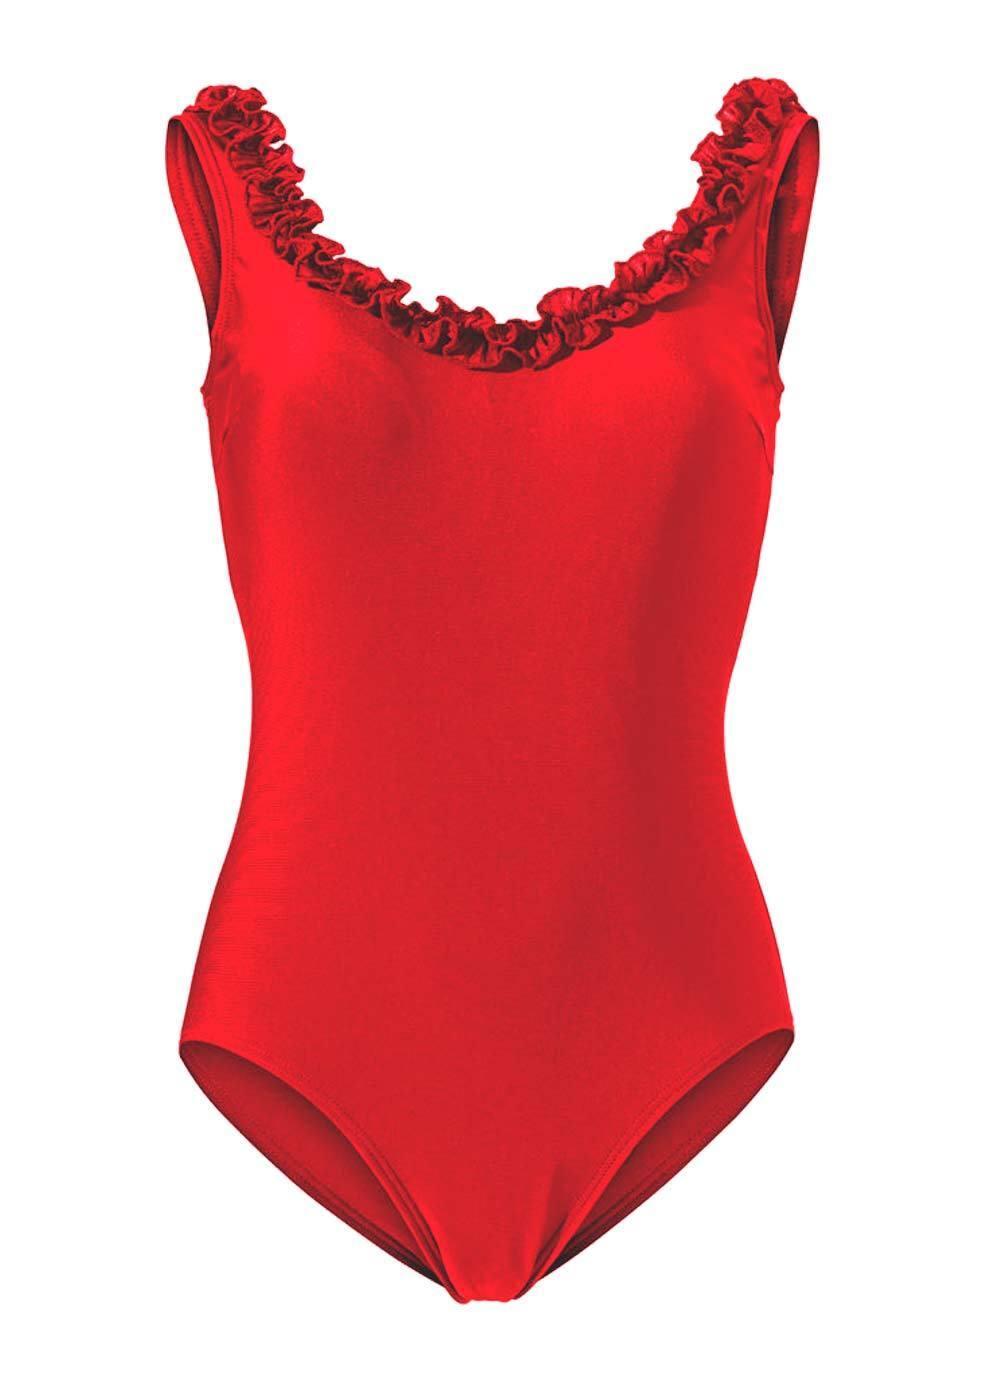 TCJ 017.306 Optimizer Optimizer Optimizer Badeanzug Bikini Bademode Strand Mode Beachwear Sommer rot | Deutschland Store  | Schön  | Hochwertig  09f3d3